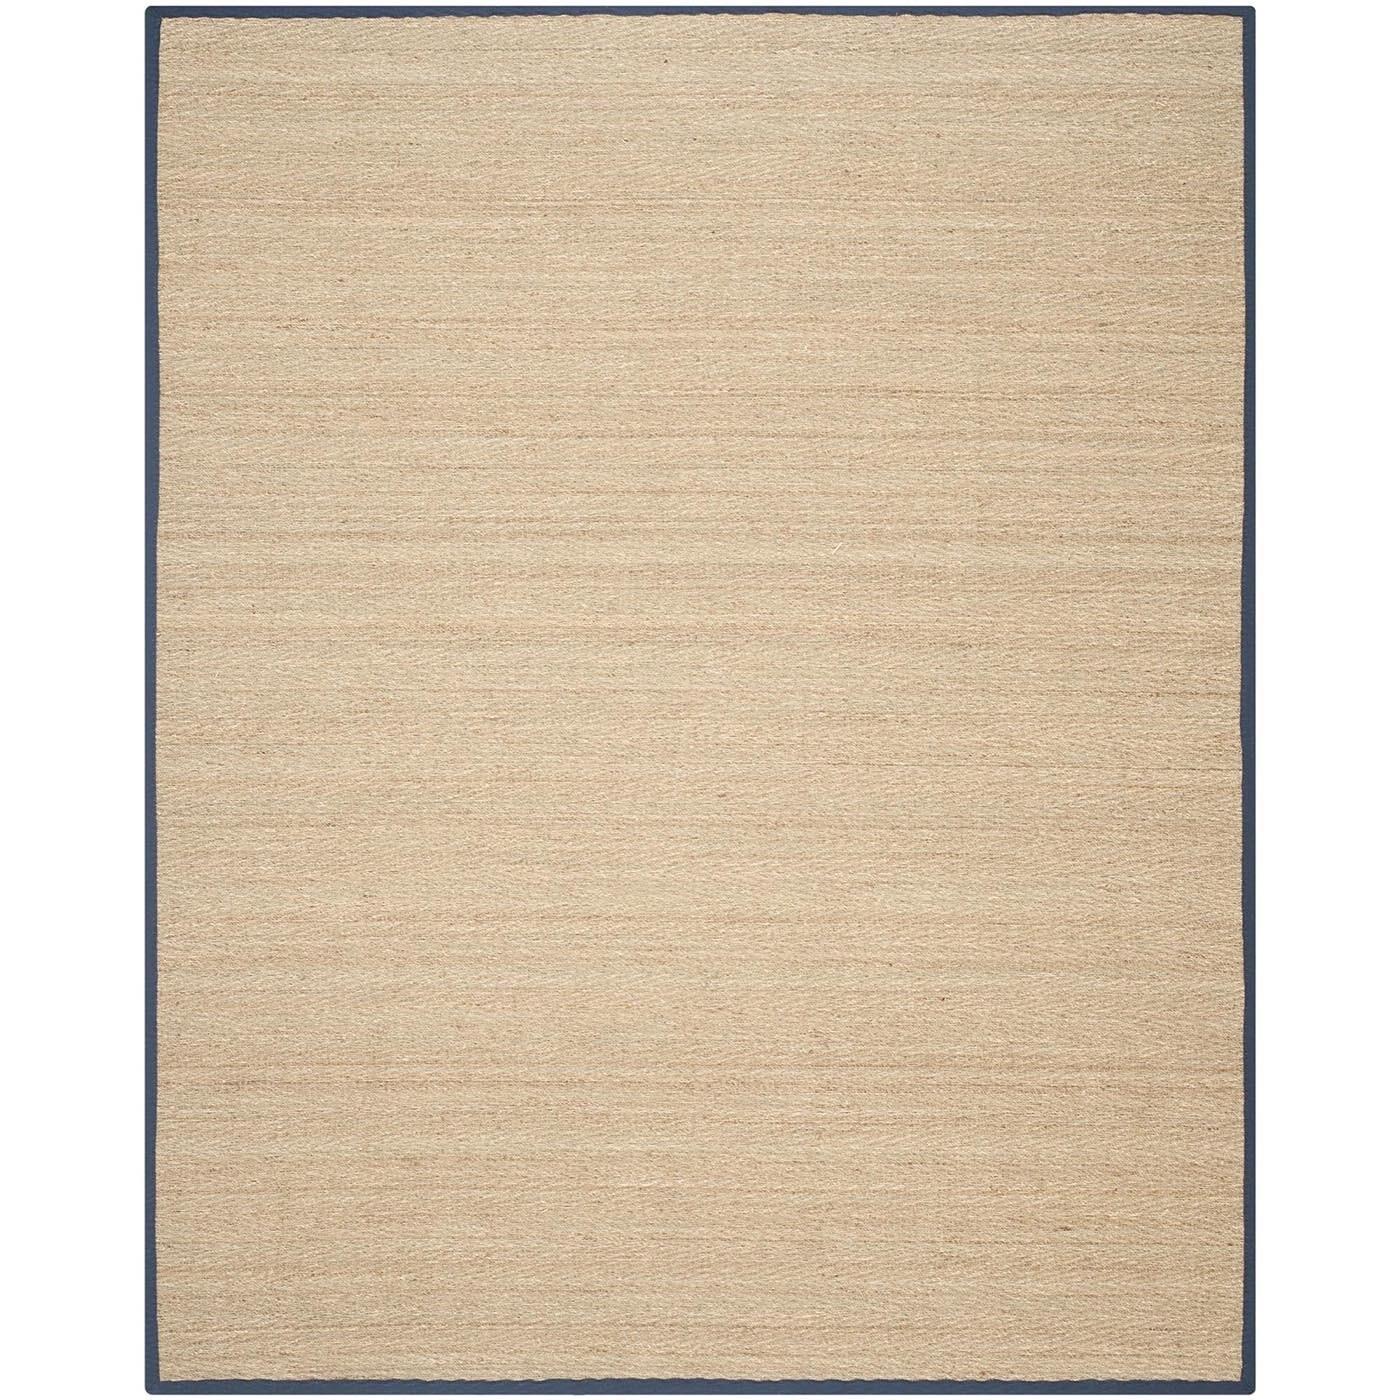 weave image category by grey rugs alt herringbone x rug reversible flat peruvian